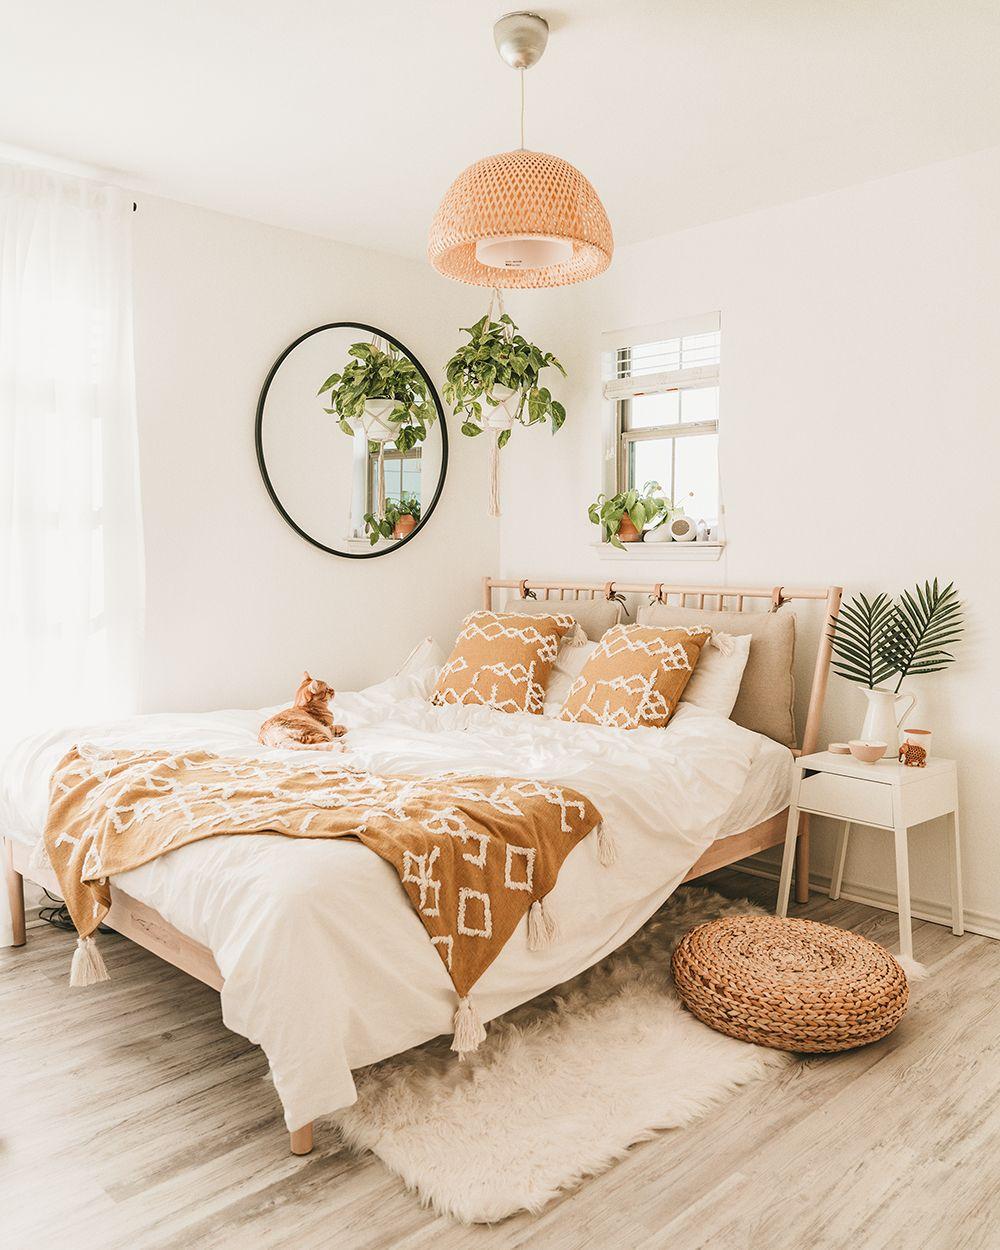 Ikea Bedroom Makeover For Under 600 Room Decor Bedroom Room